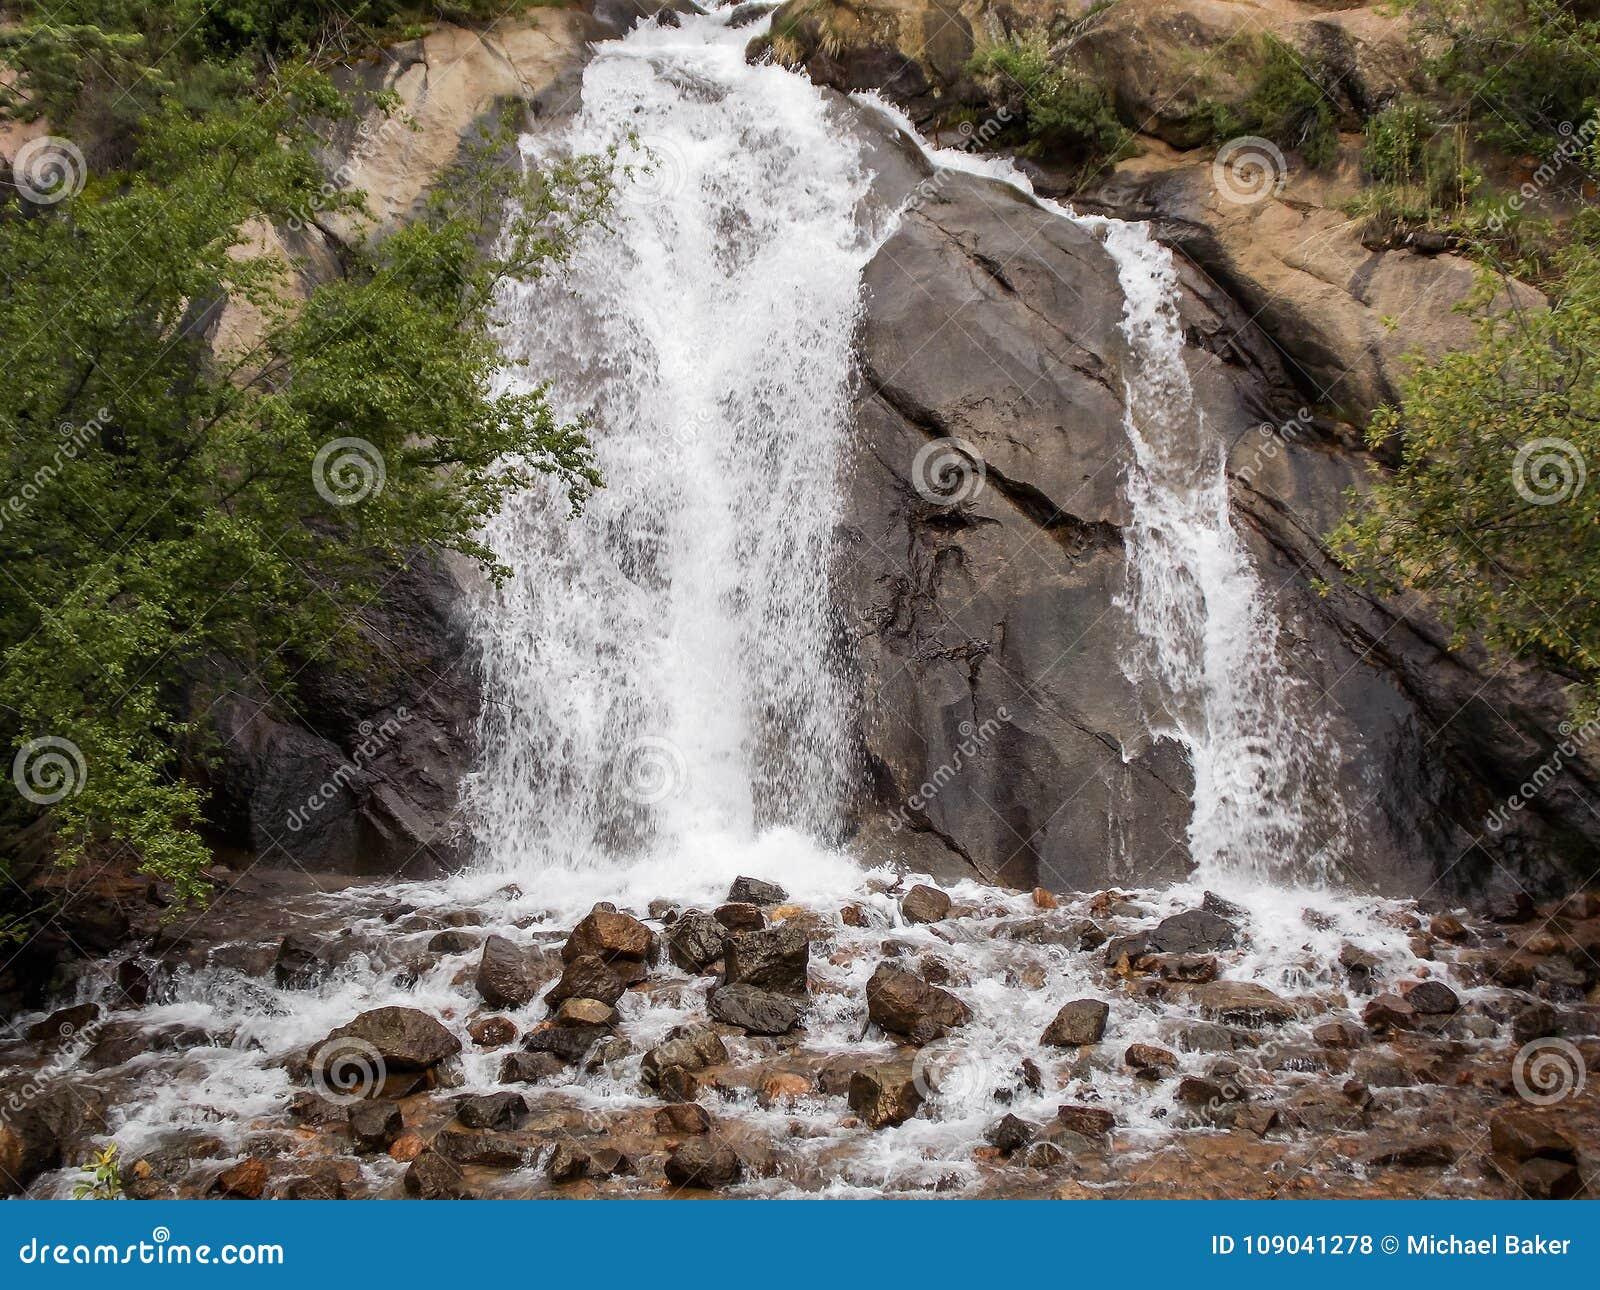 Serene Sound of the Waterfall Helen Hunt Falls